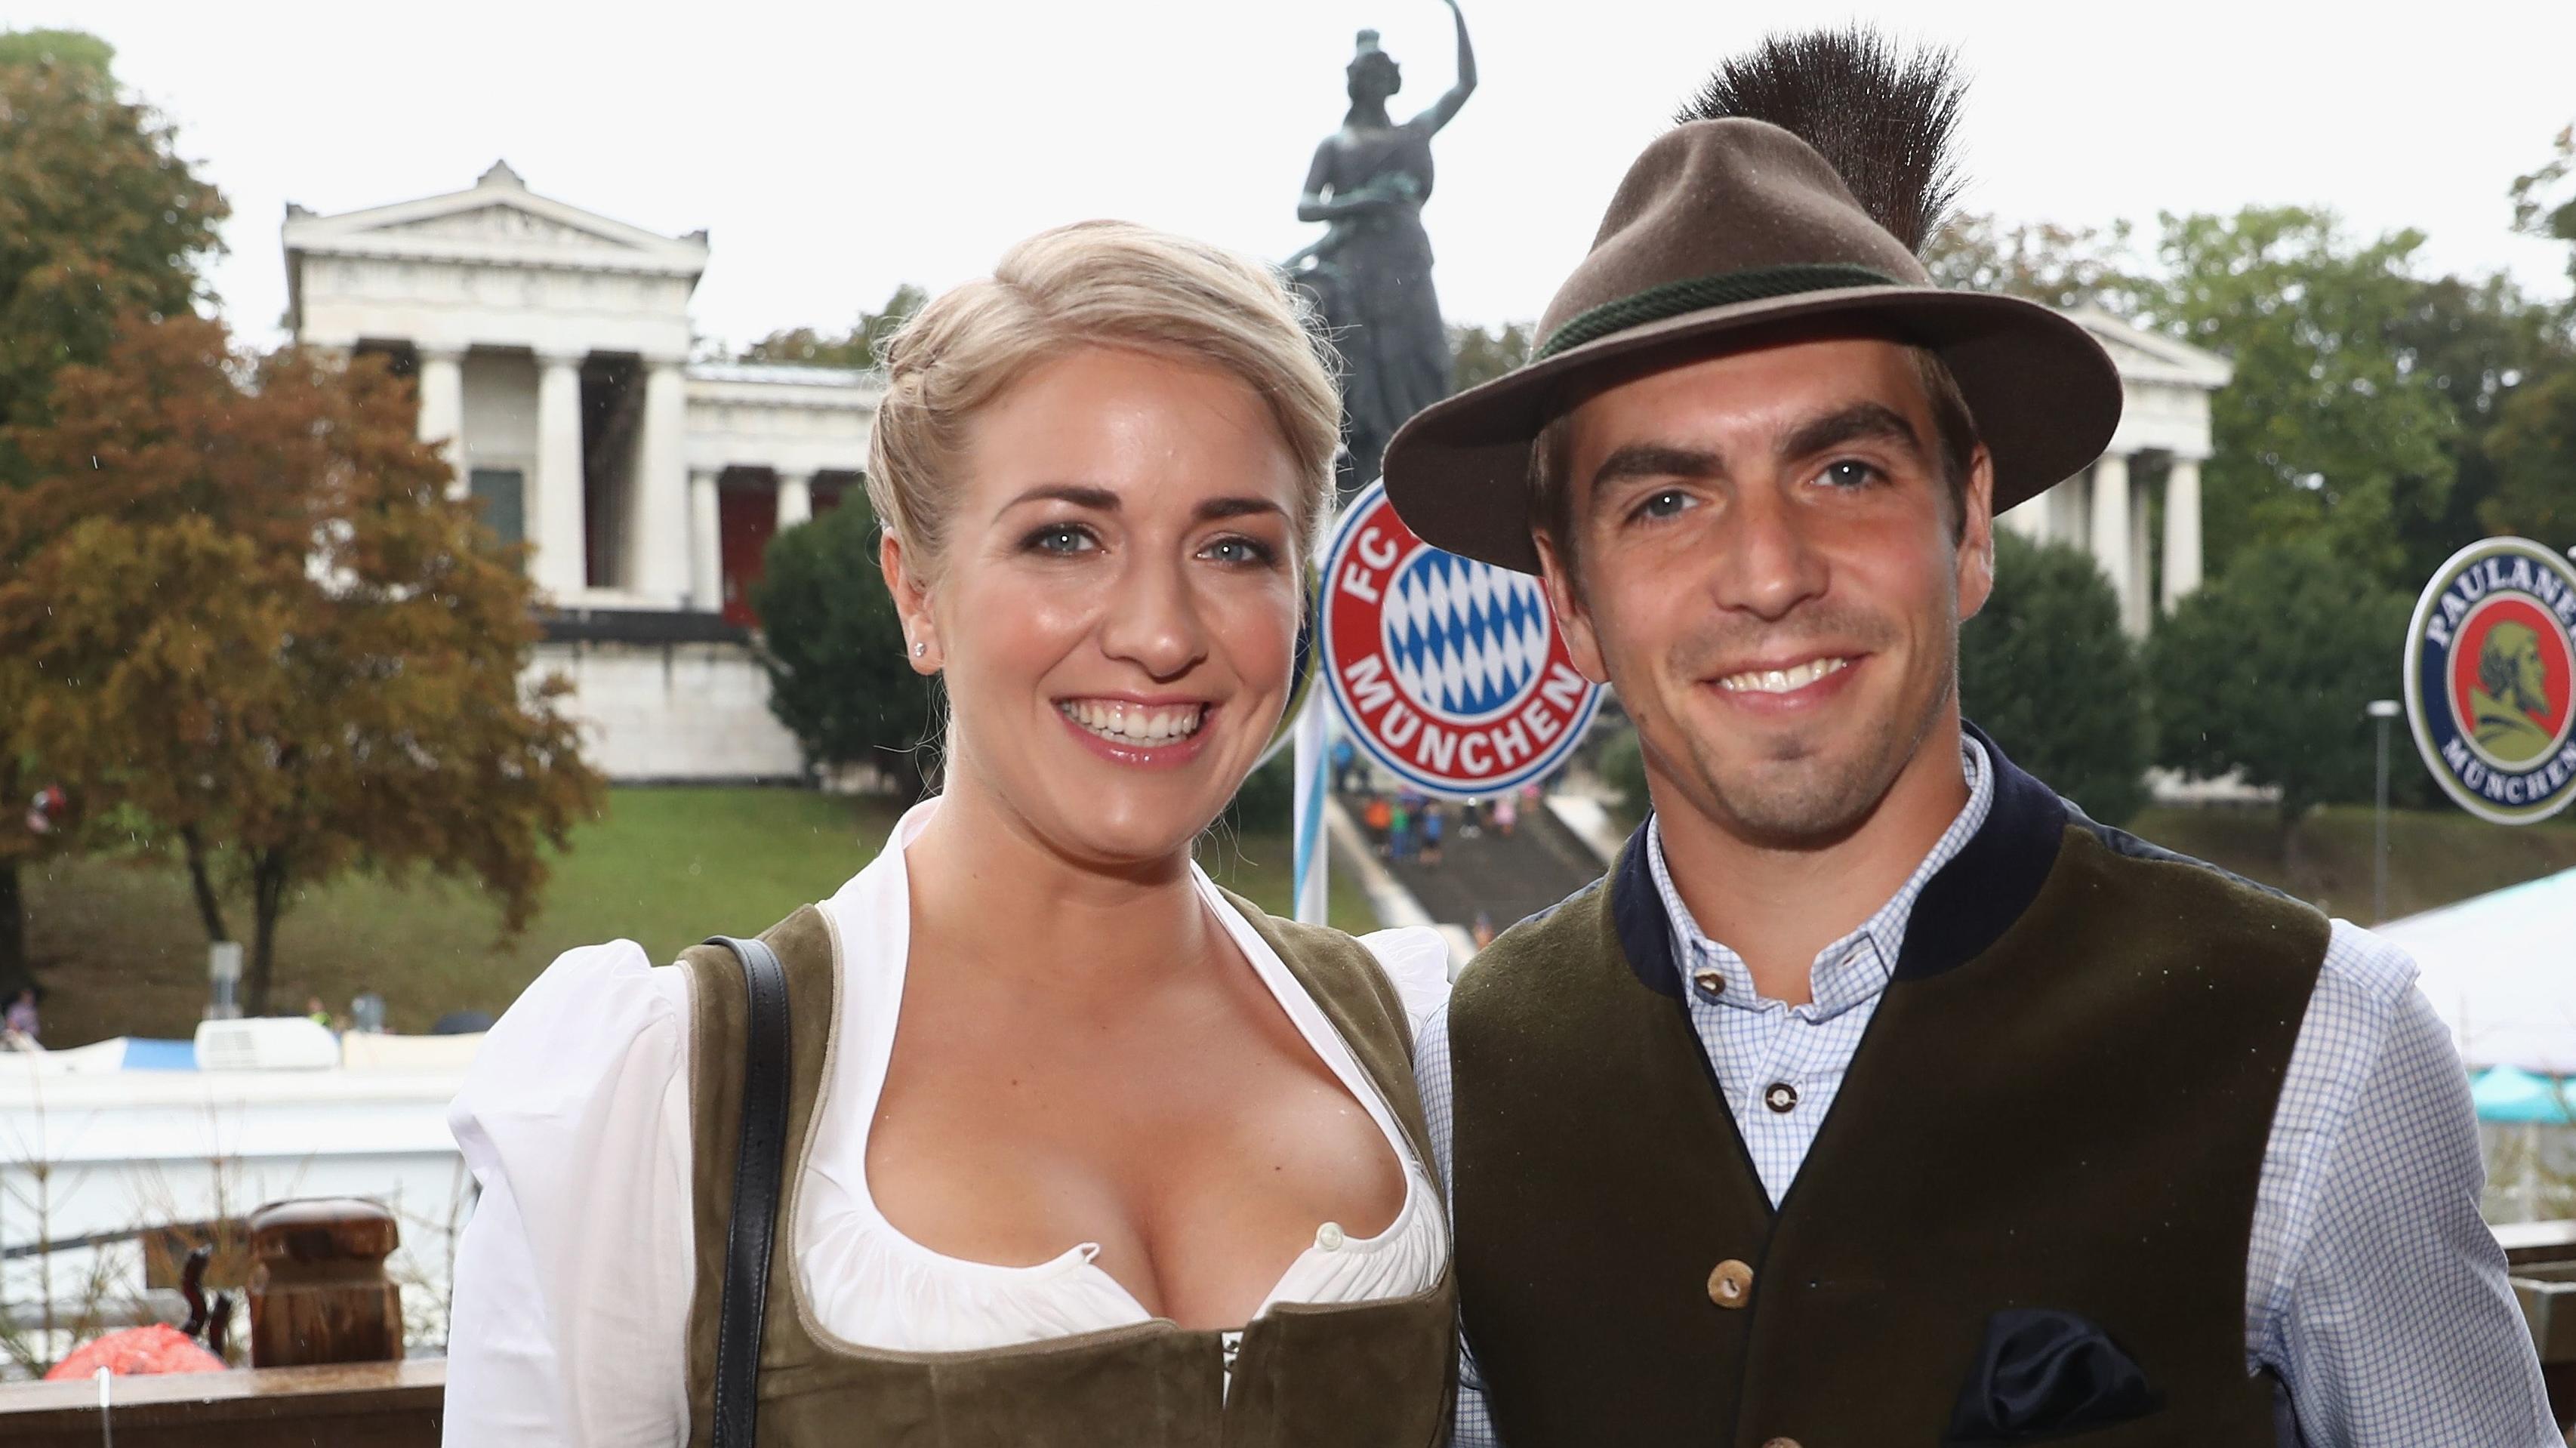 Philipp Lahm mit Ehefrau Claudia auf dem Münchner Oktoberfest